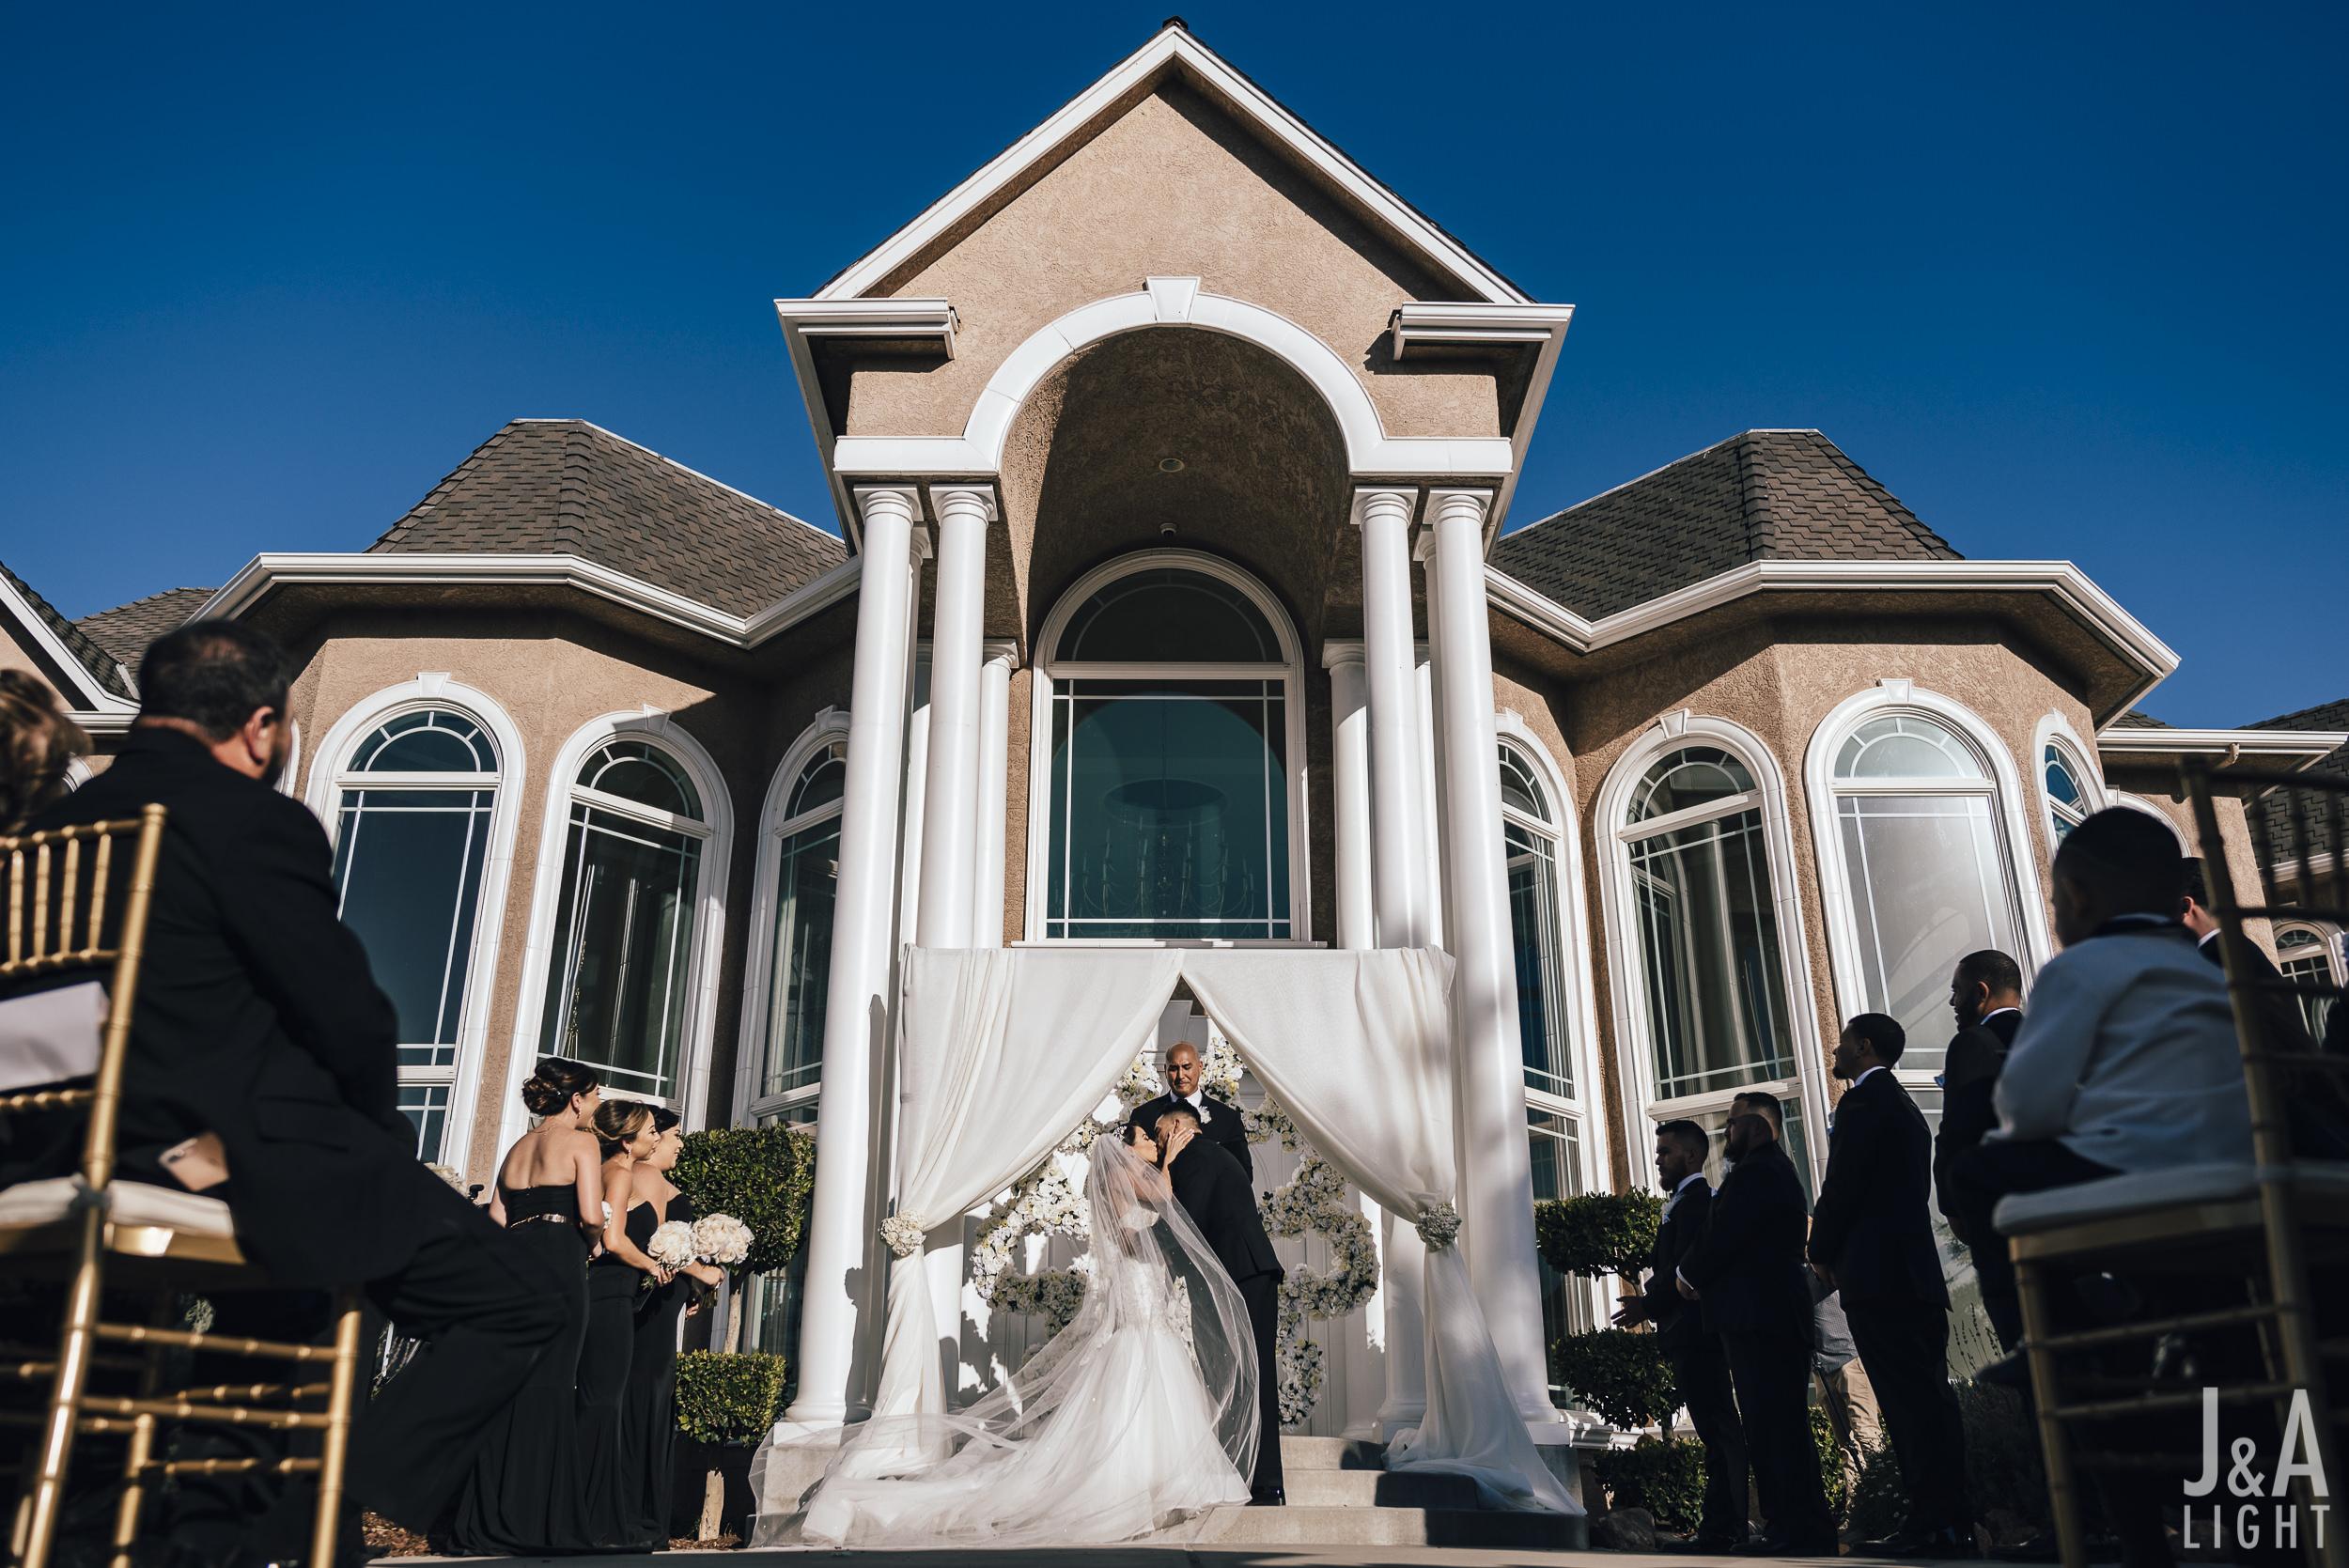 20171014-JanDan-LosBanos-GlassMansion-Wedding-Blog-042.jpg